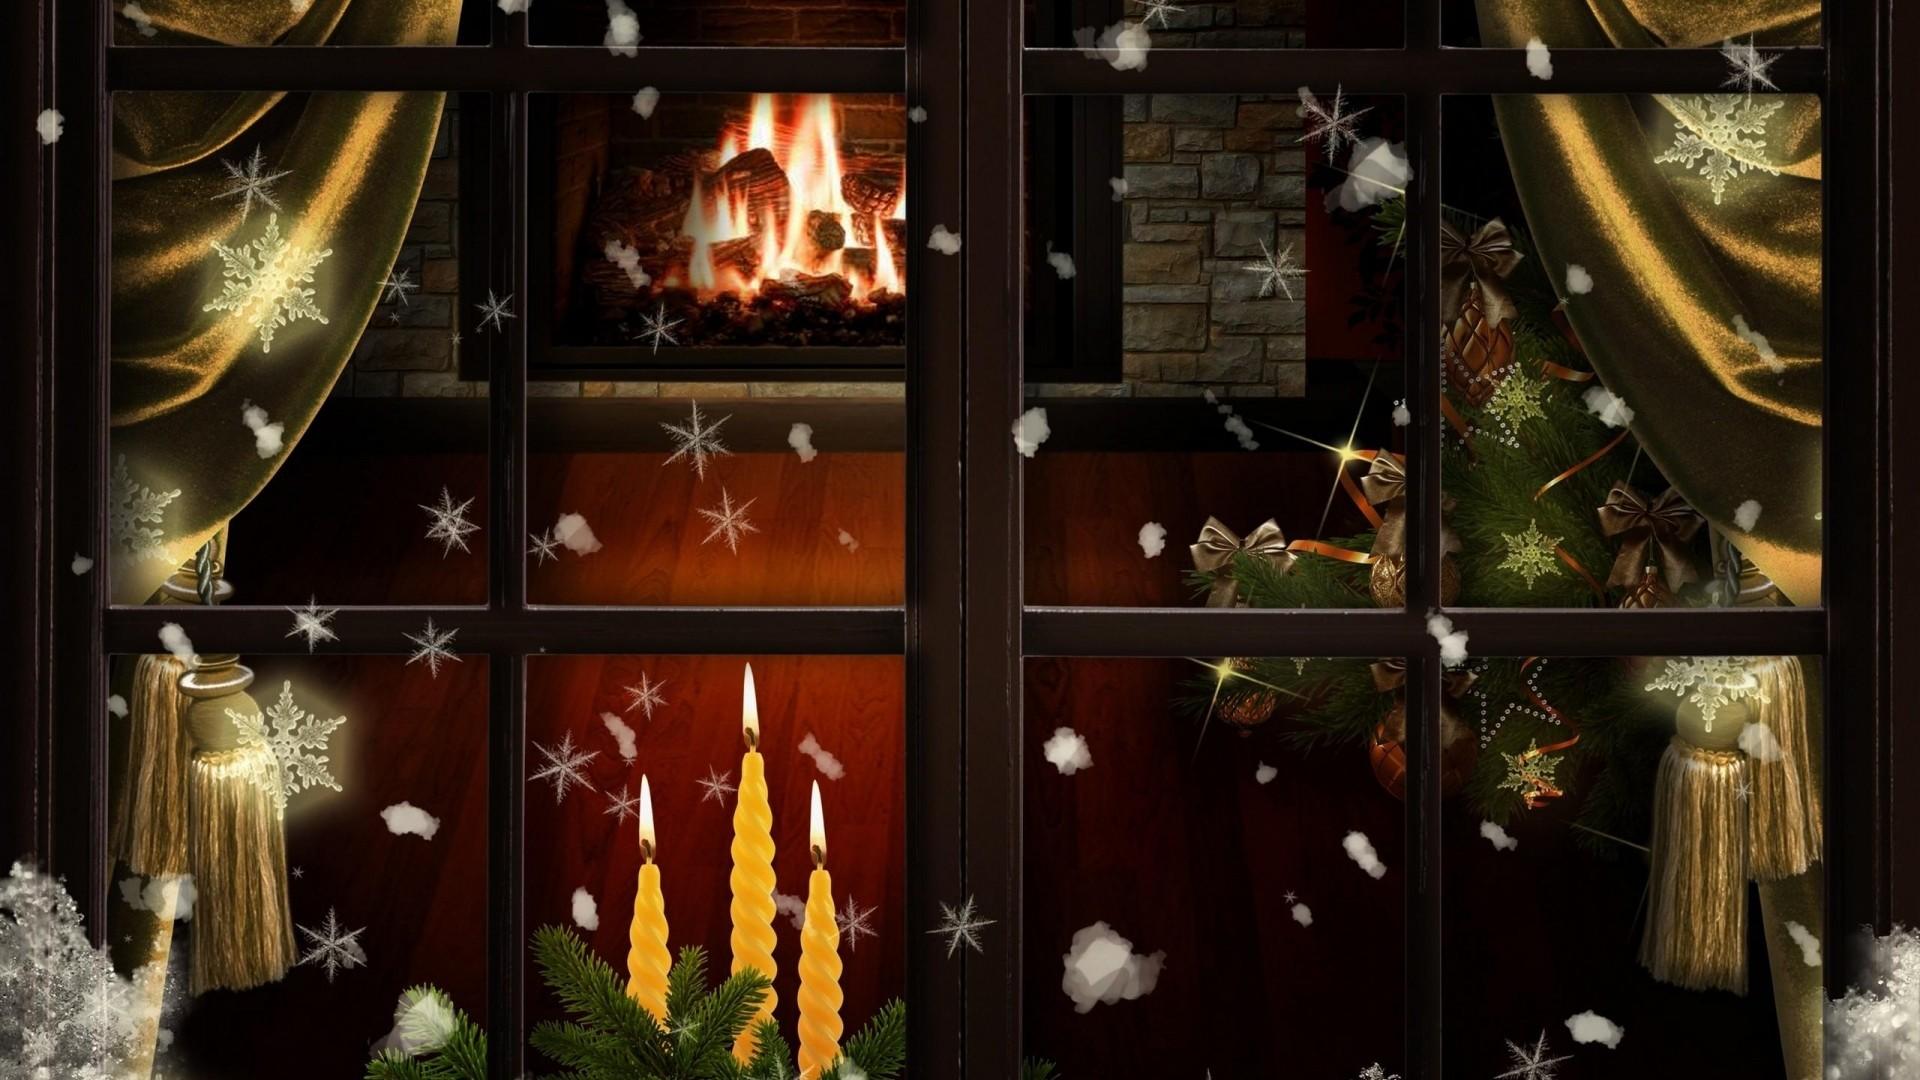 Wallpaper window, fireplace, candles, christmas tree, cozy,  christmas